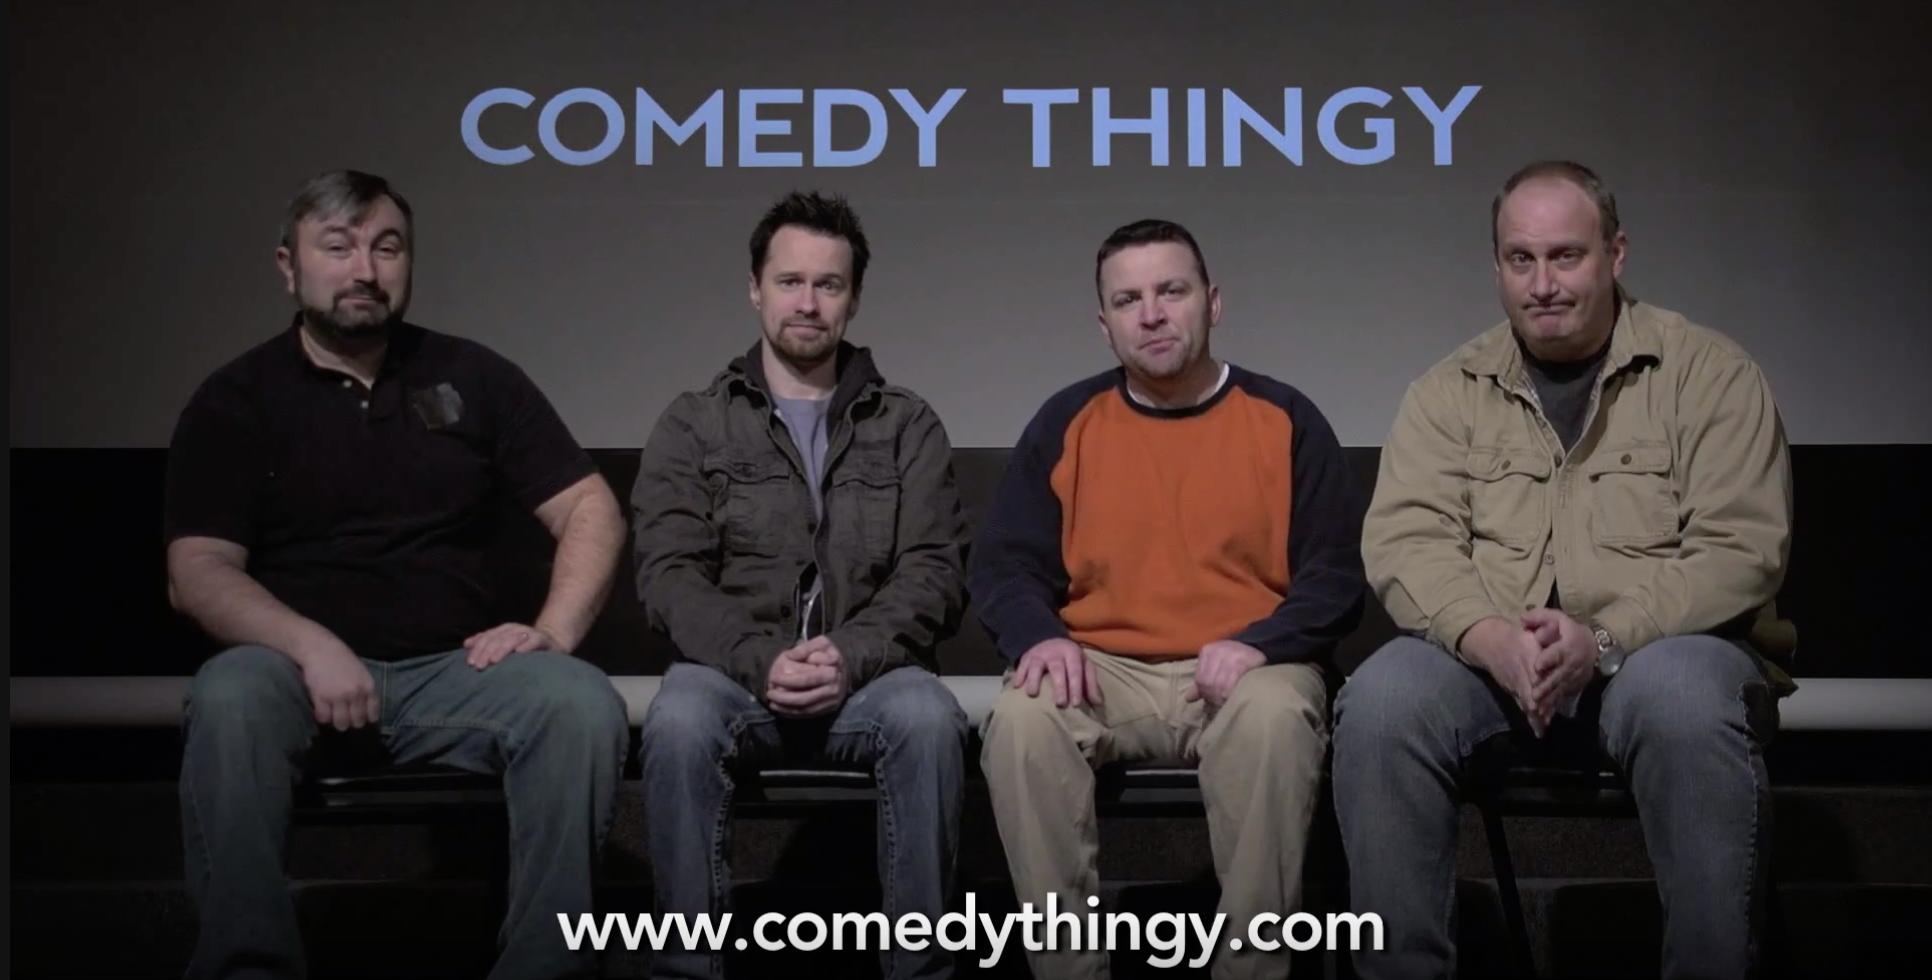 Indiegogo 2014 Campaign Video